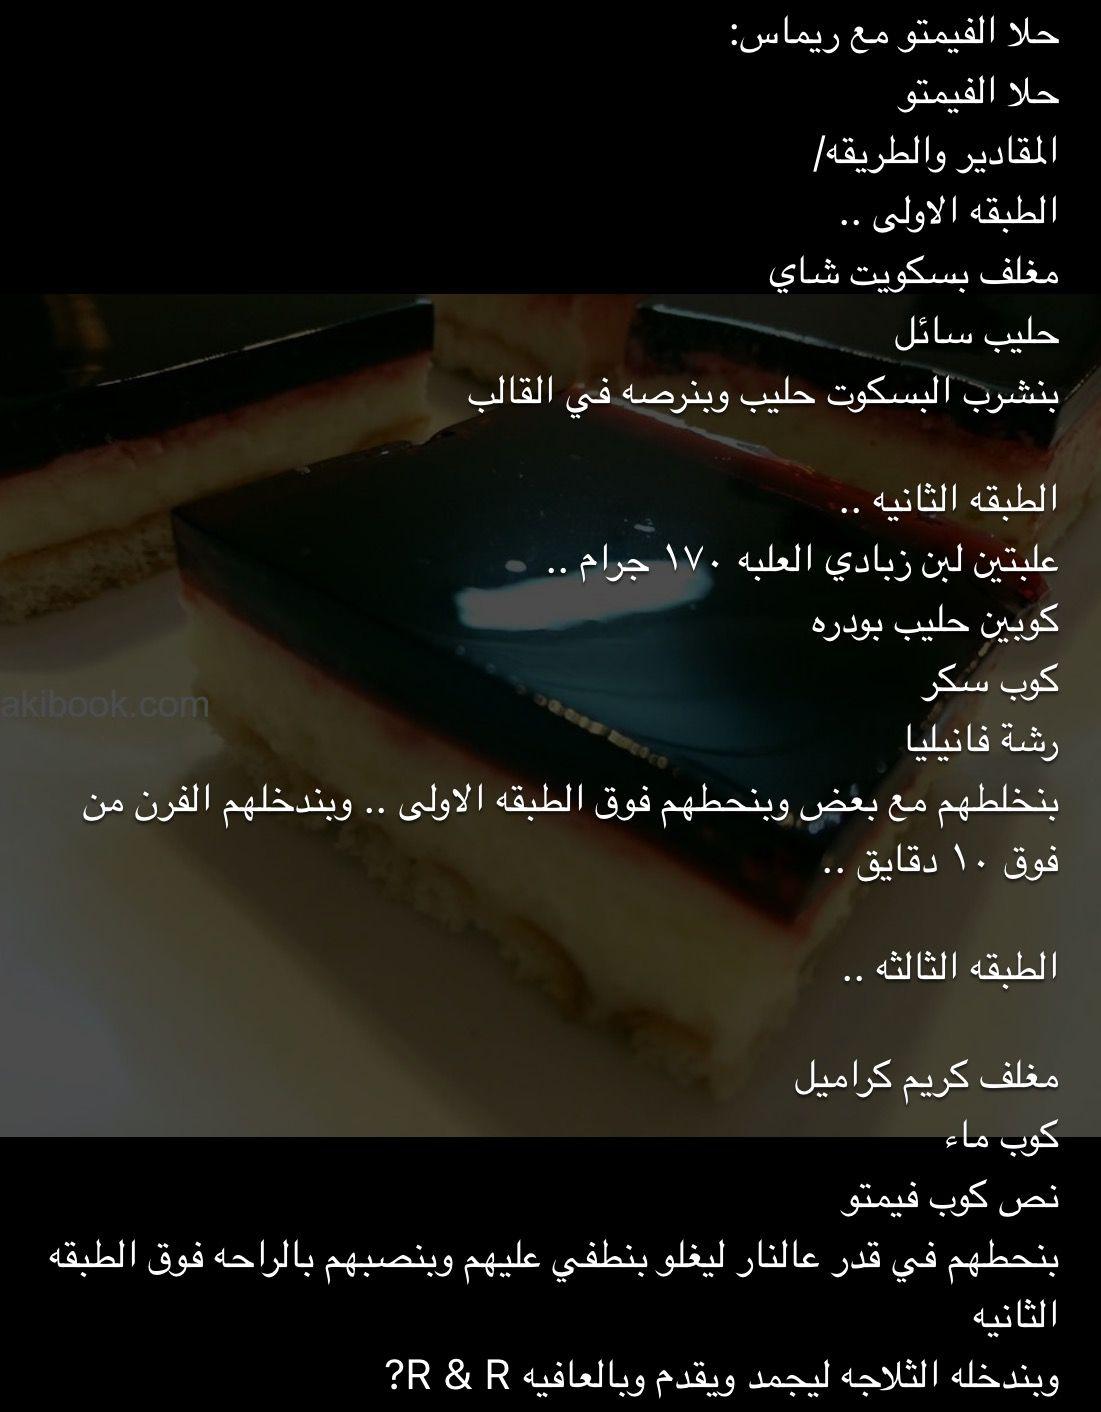 حلا الفيمتو Arabic Dessert Layered Desserts Desserts